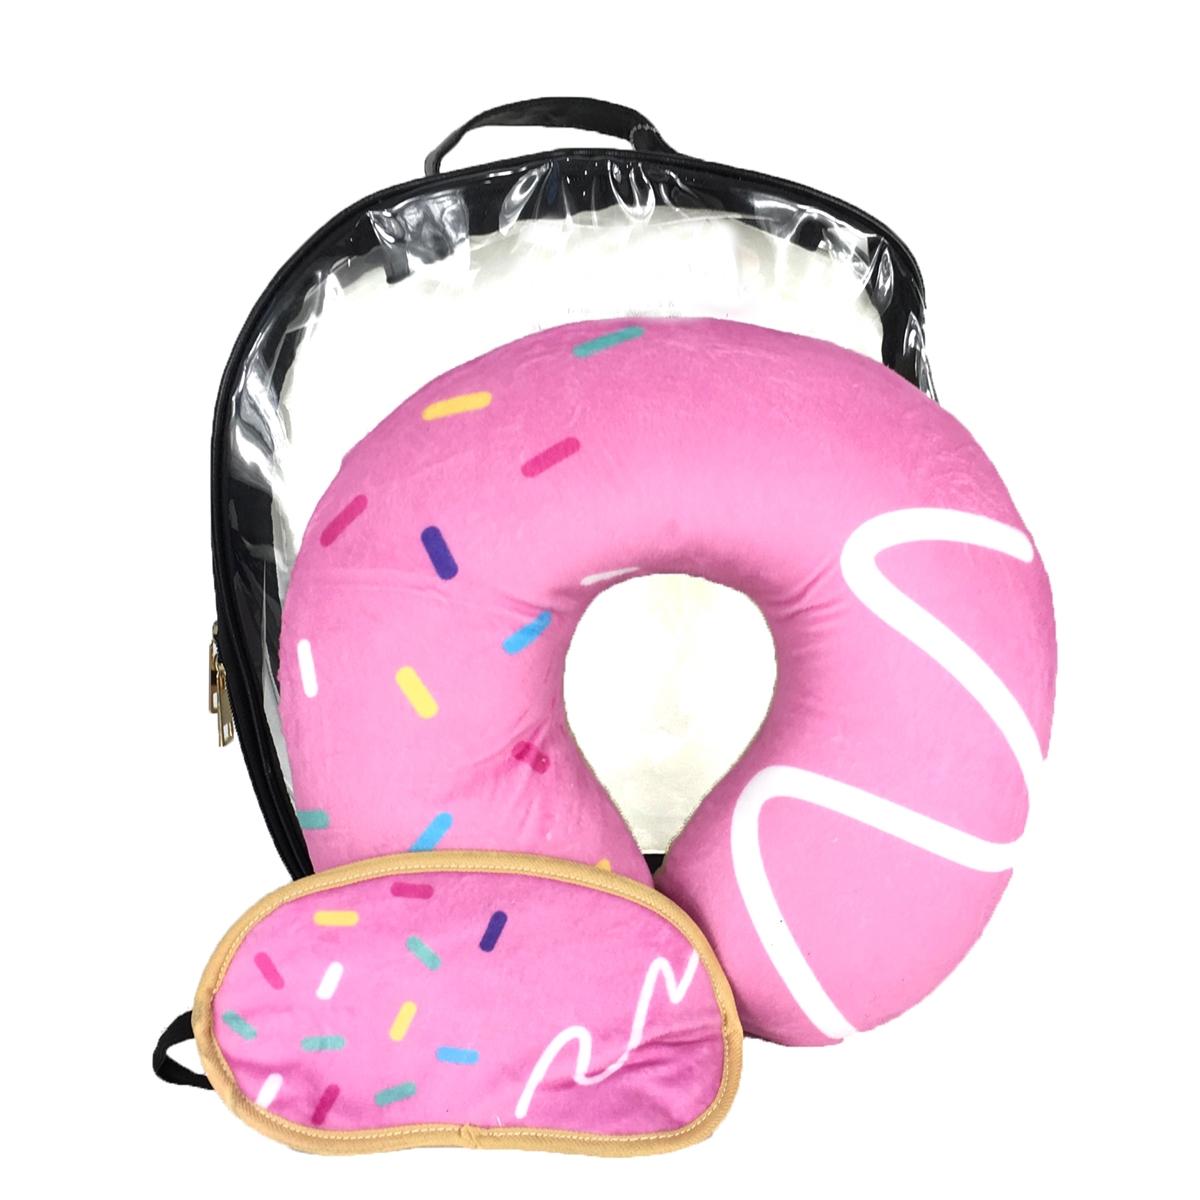 sprinke donut neck pillow eye mask clear travel case set